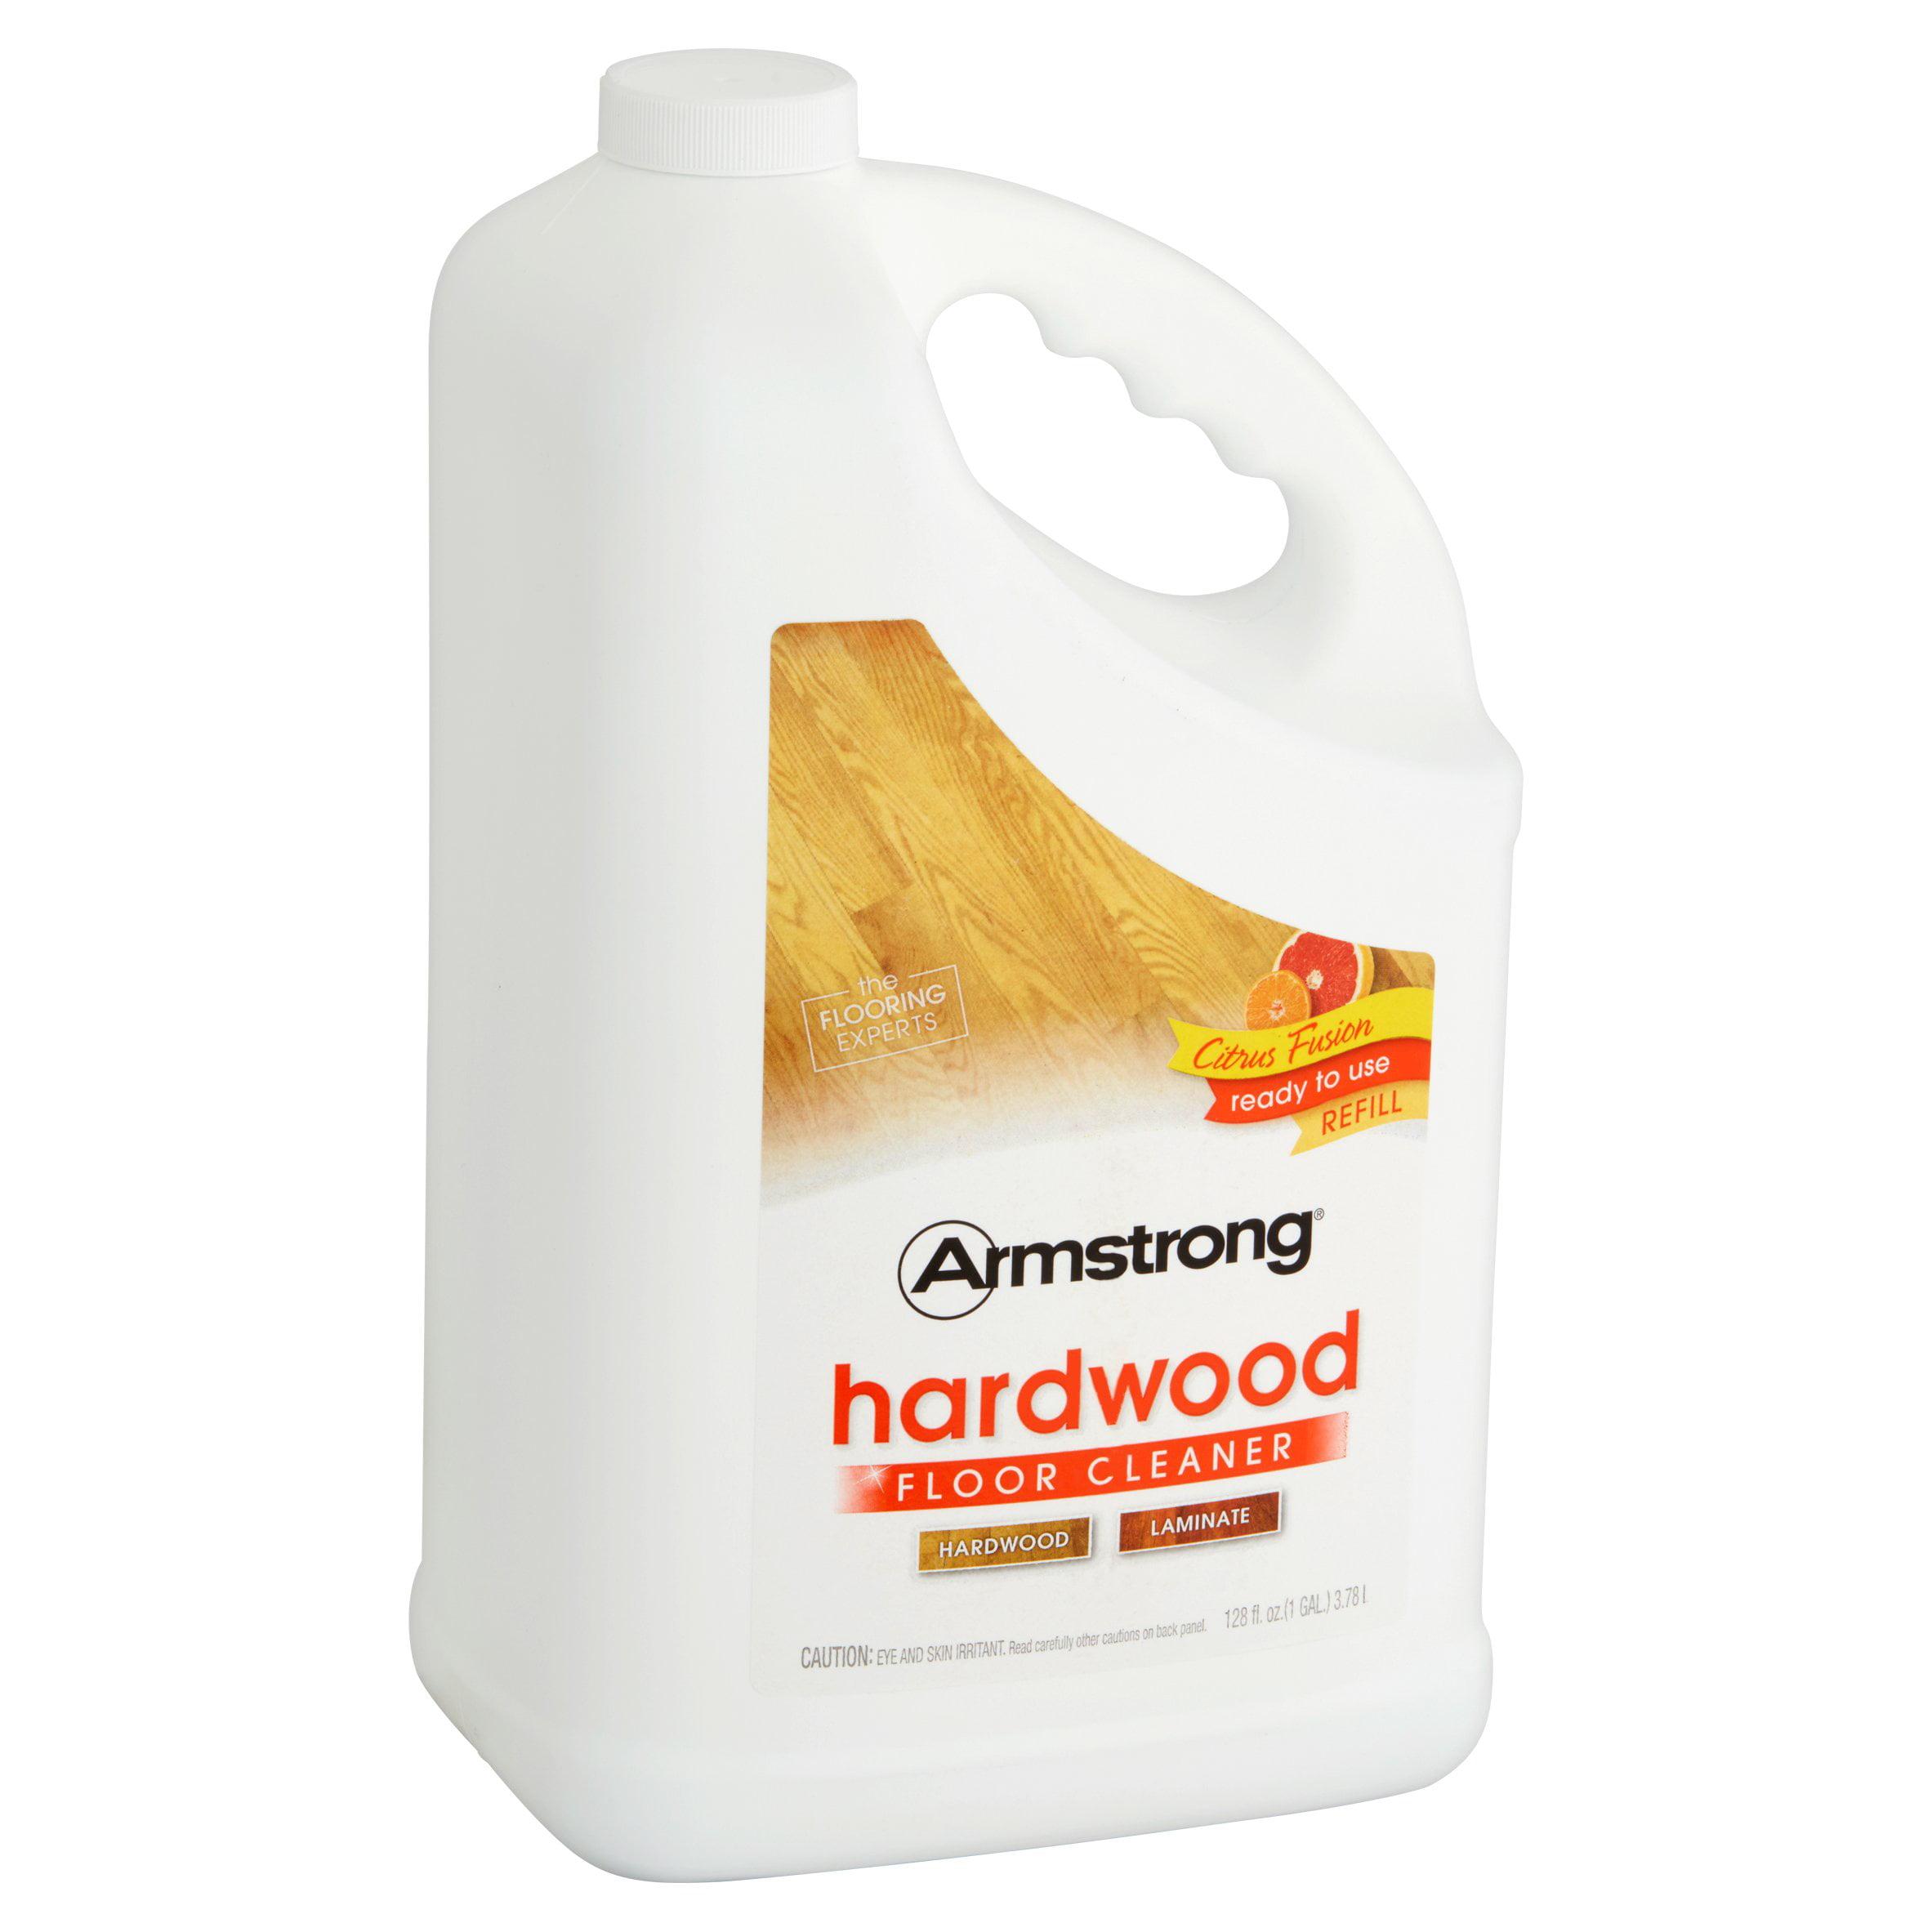 Lovely Armstrong Hardwood Citrus Fusion Floor Cleaner Refill, 128 Fl Oz    Walmart.com